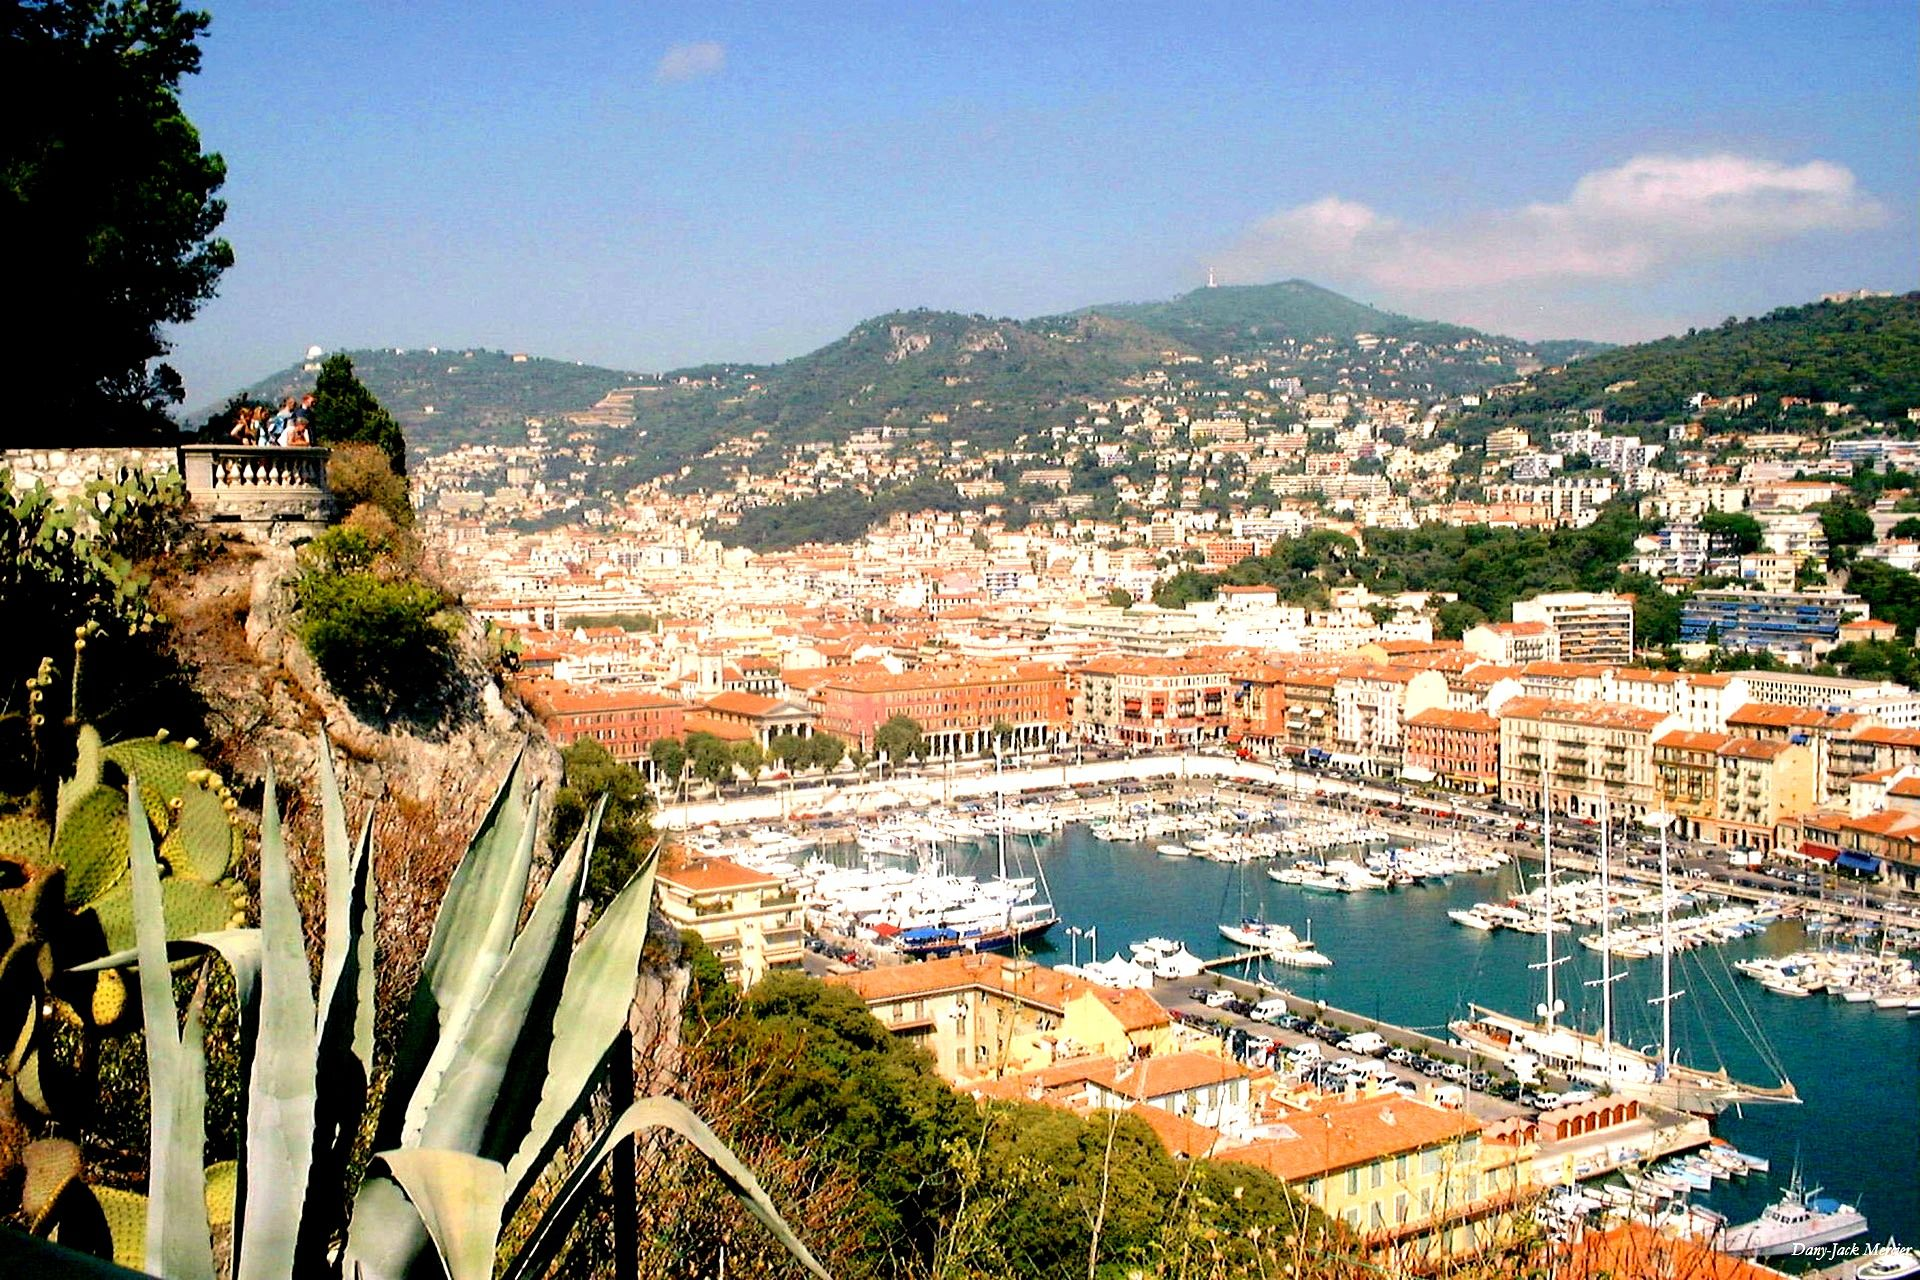 Walking on the Côte d'Azur...in Nice